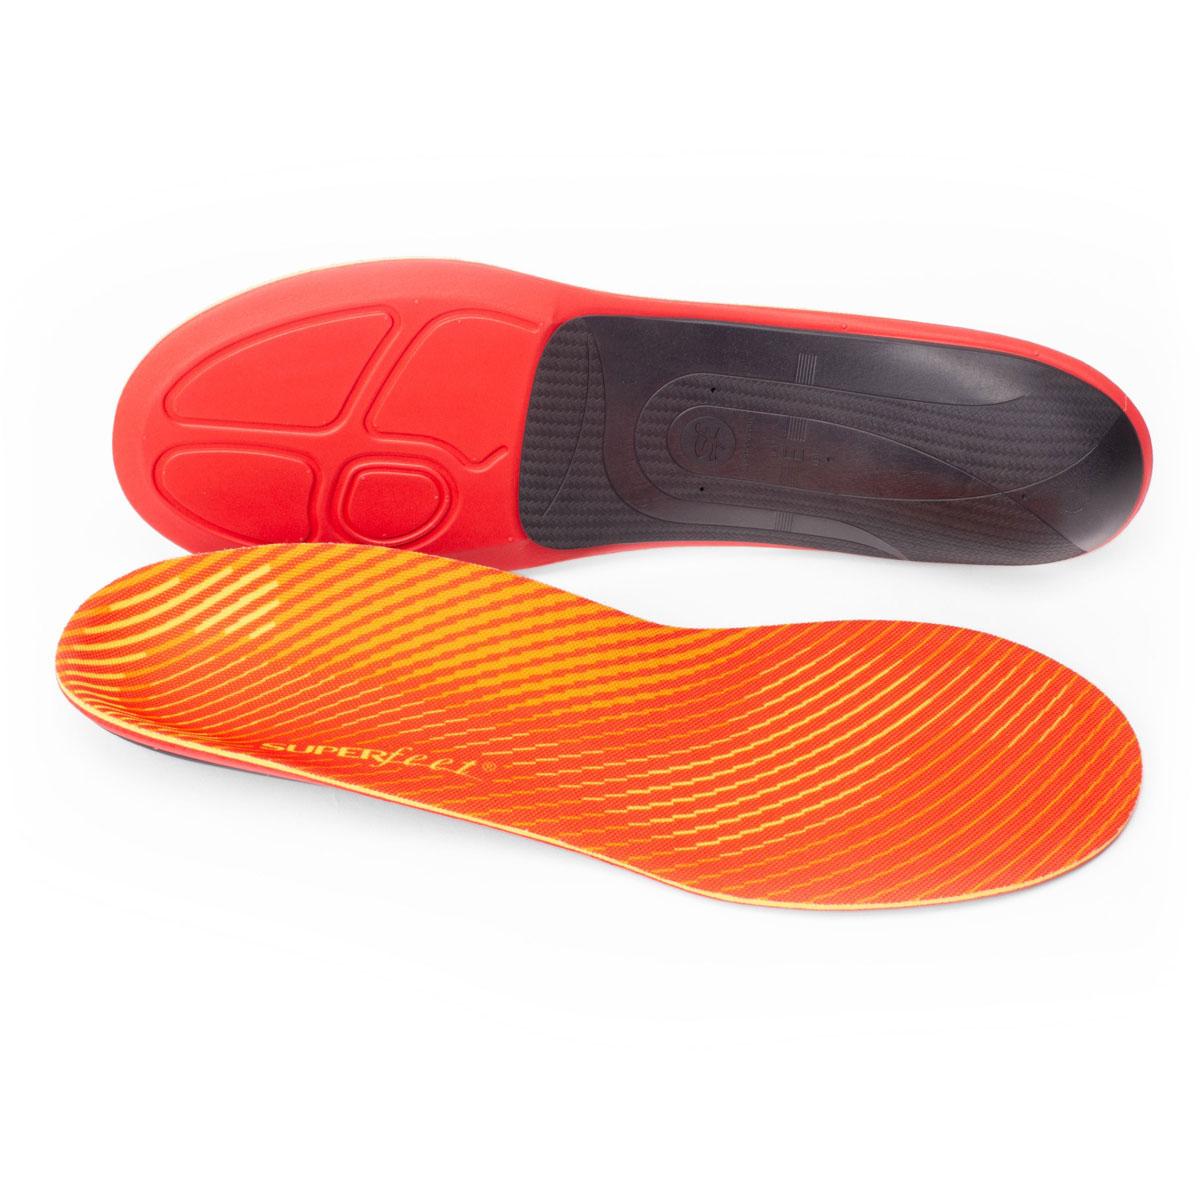 Superfeet RUN Pain Relief - Color: Tangerine Size: C, Tangerine, large, image 1